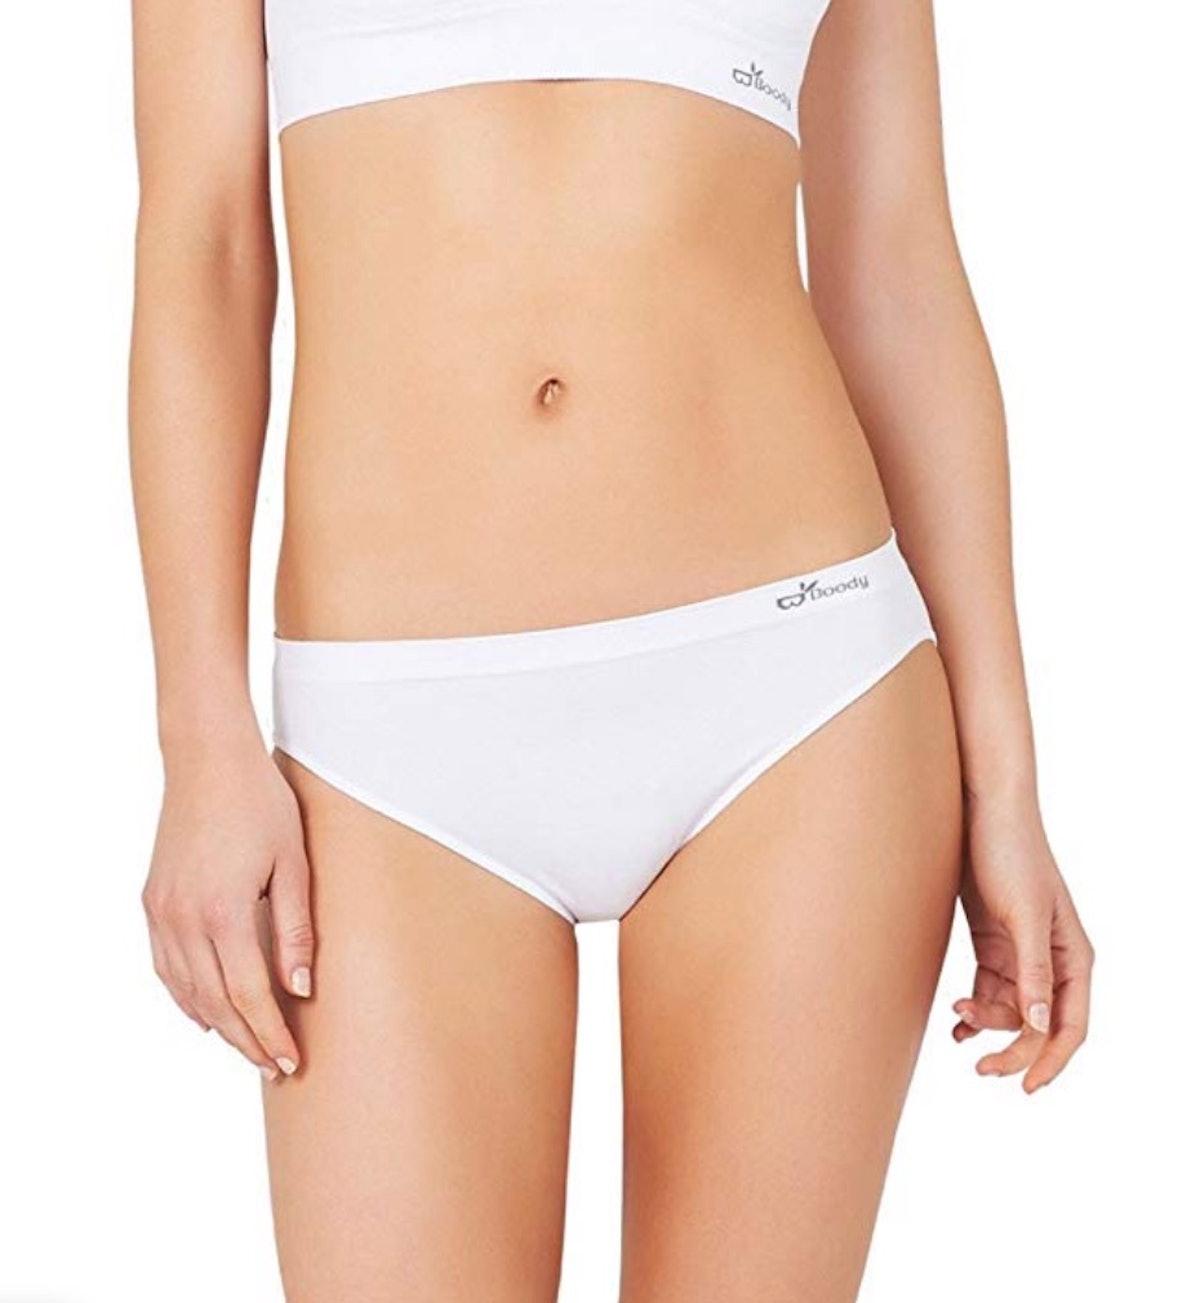 Boody Body EcoWear Women's Classic Panty